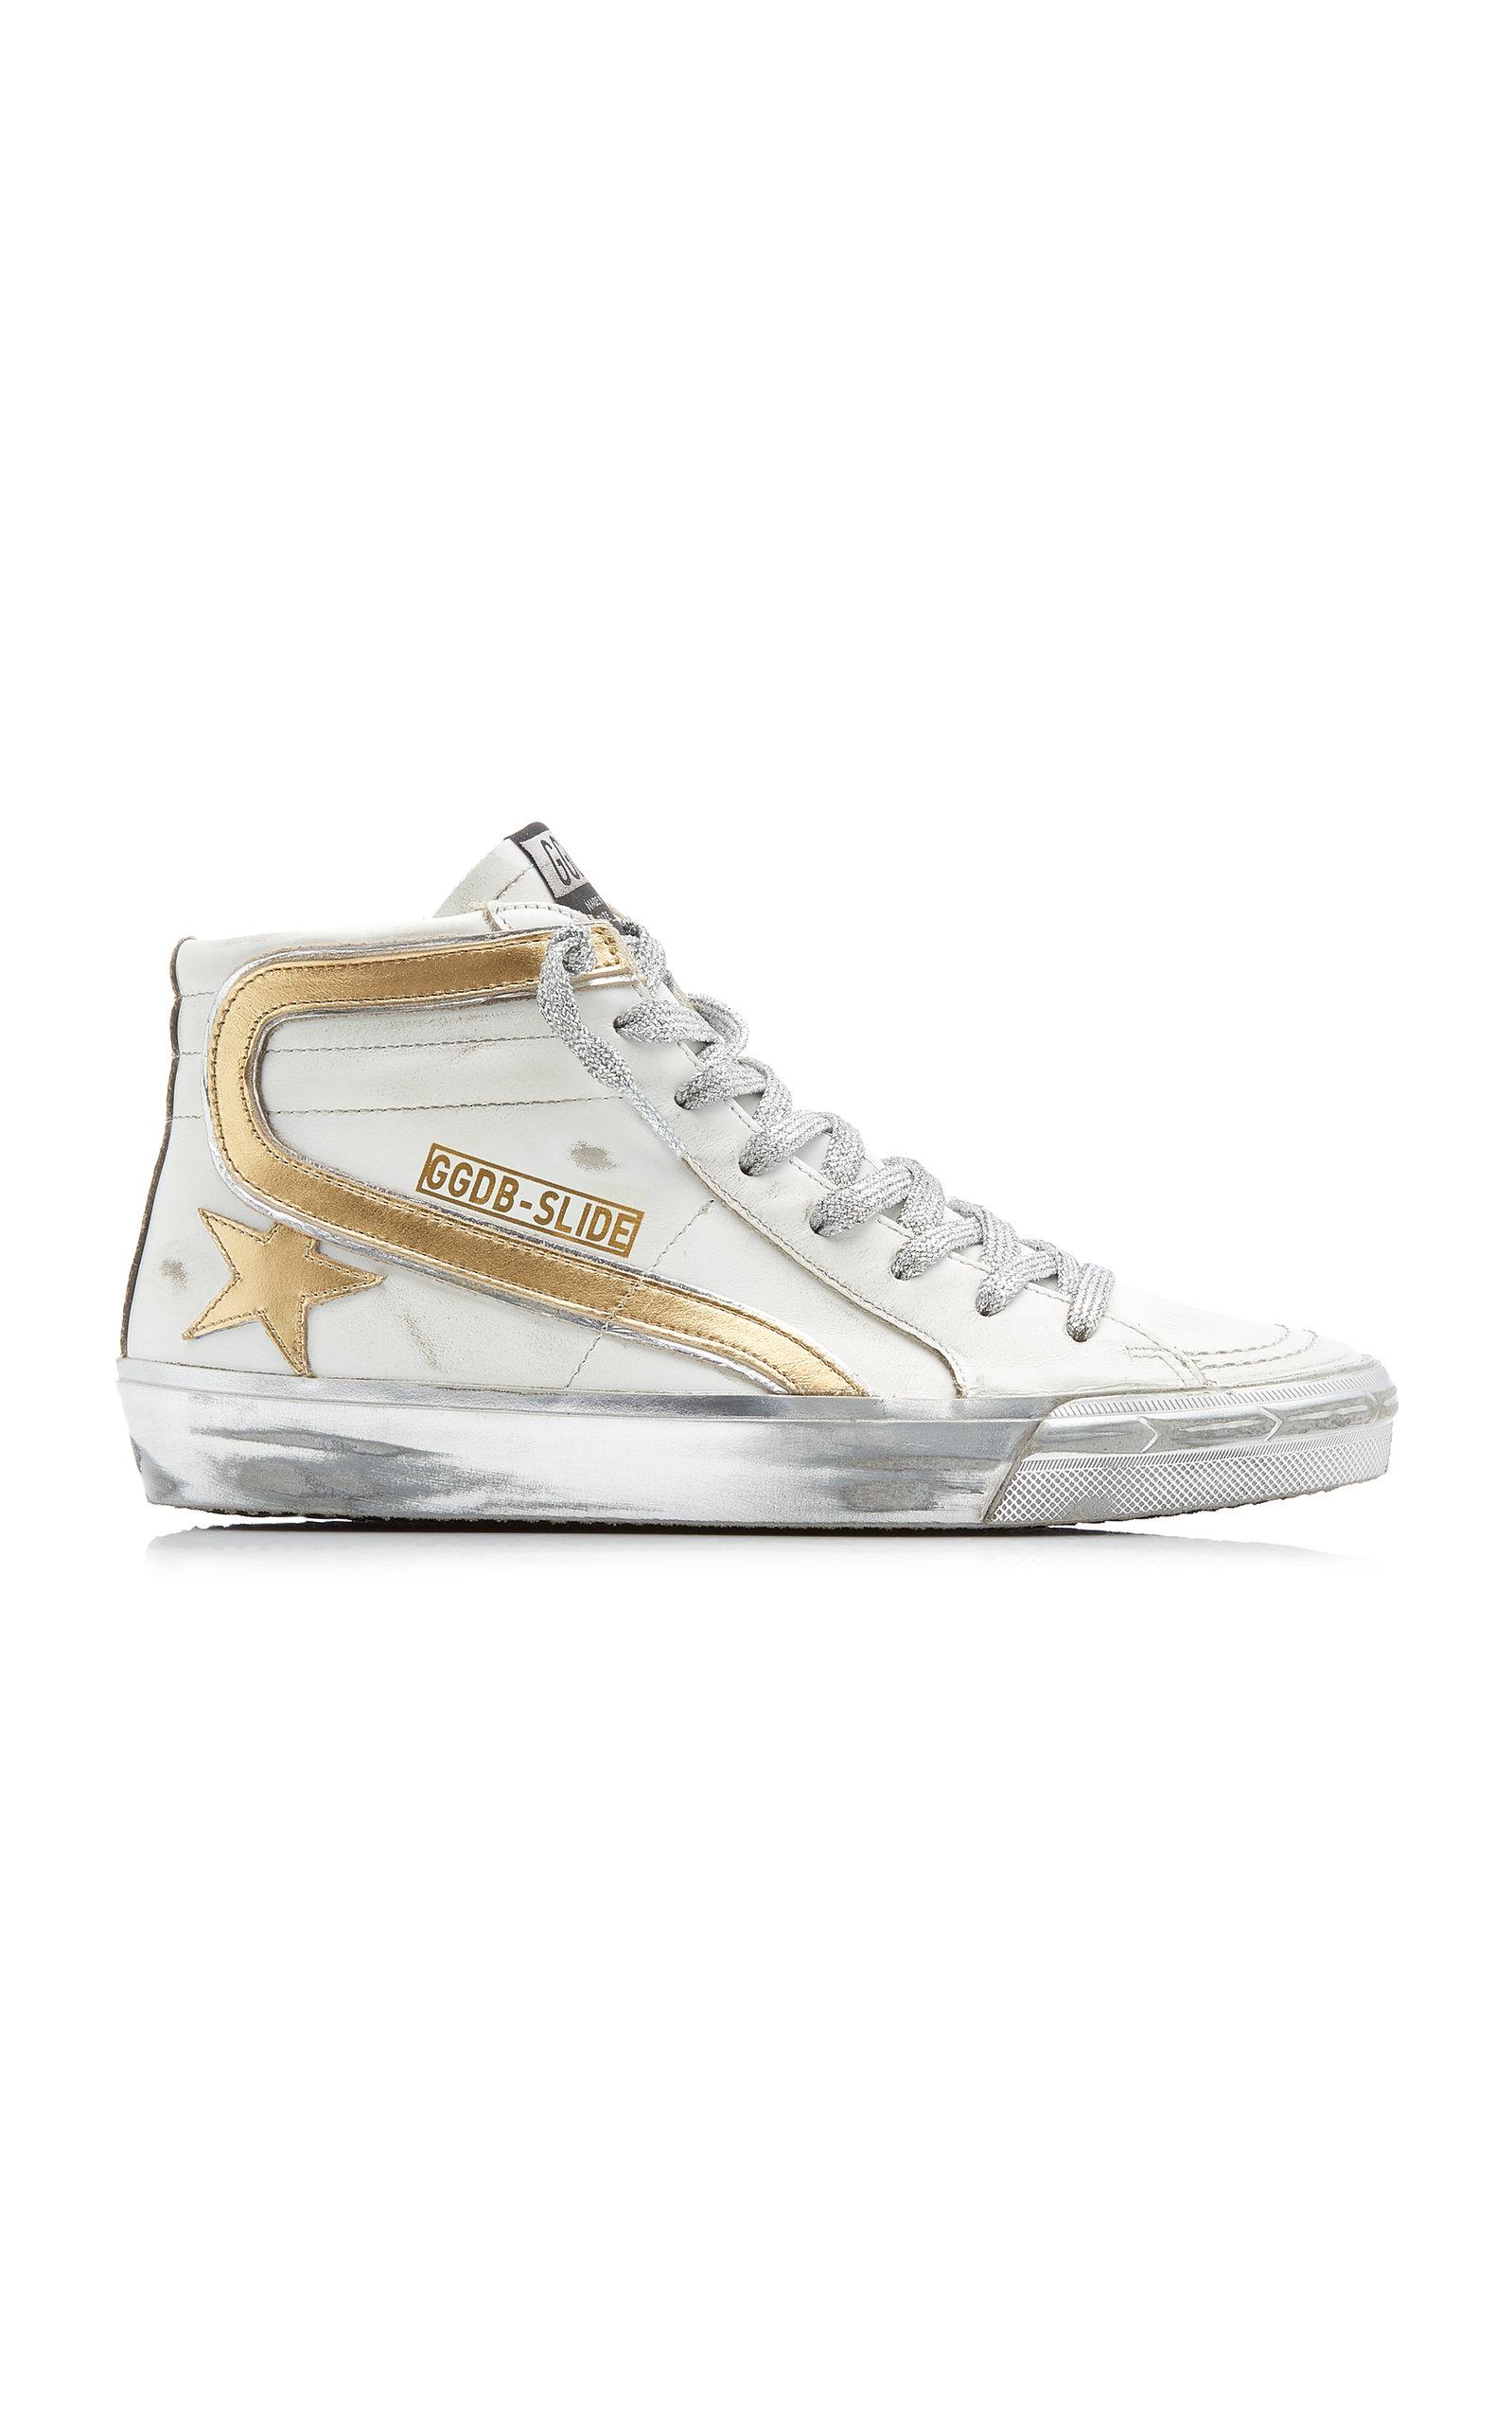 Golden Goose - Women's Slide Metallic High Top Leather Sneakers - Silver - Moda Operandi